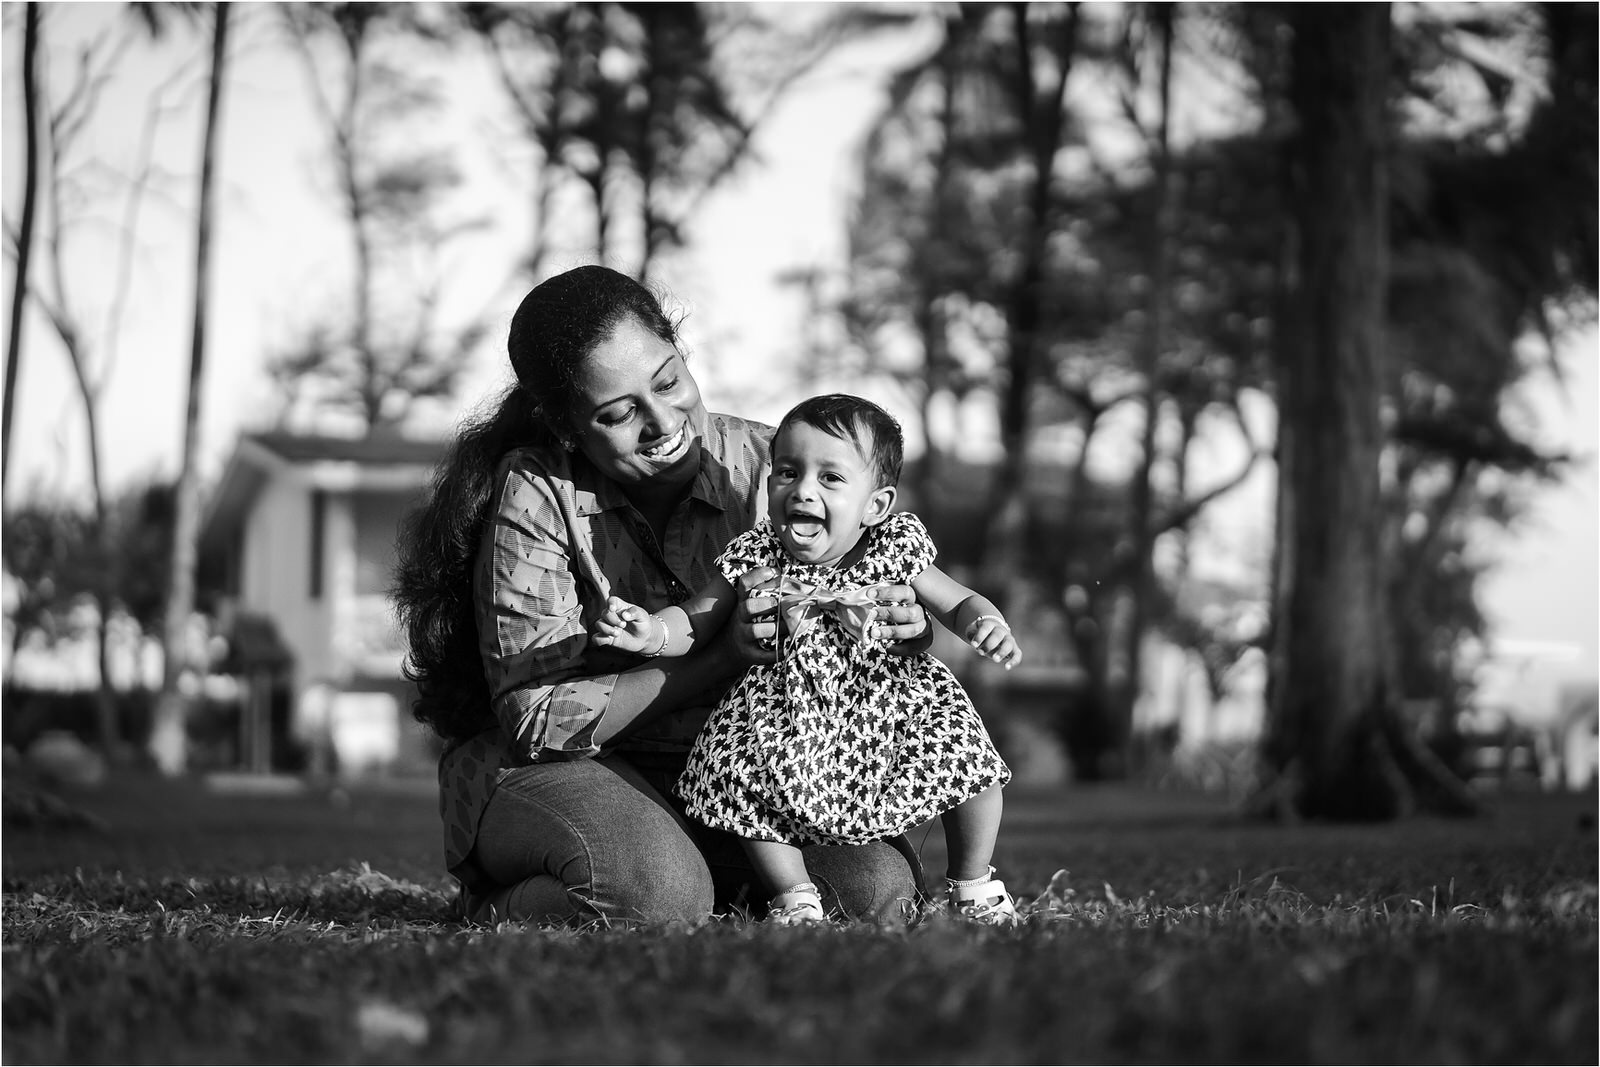 19012019-Nila-Pratyush-Family-Shoot-1143-2.jpg